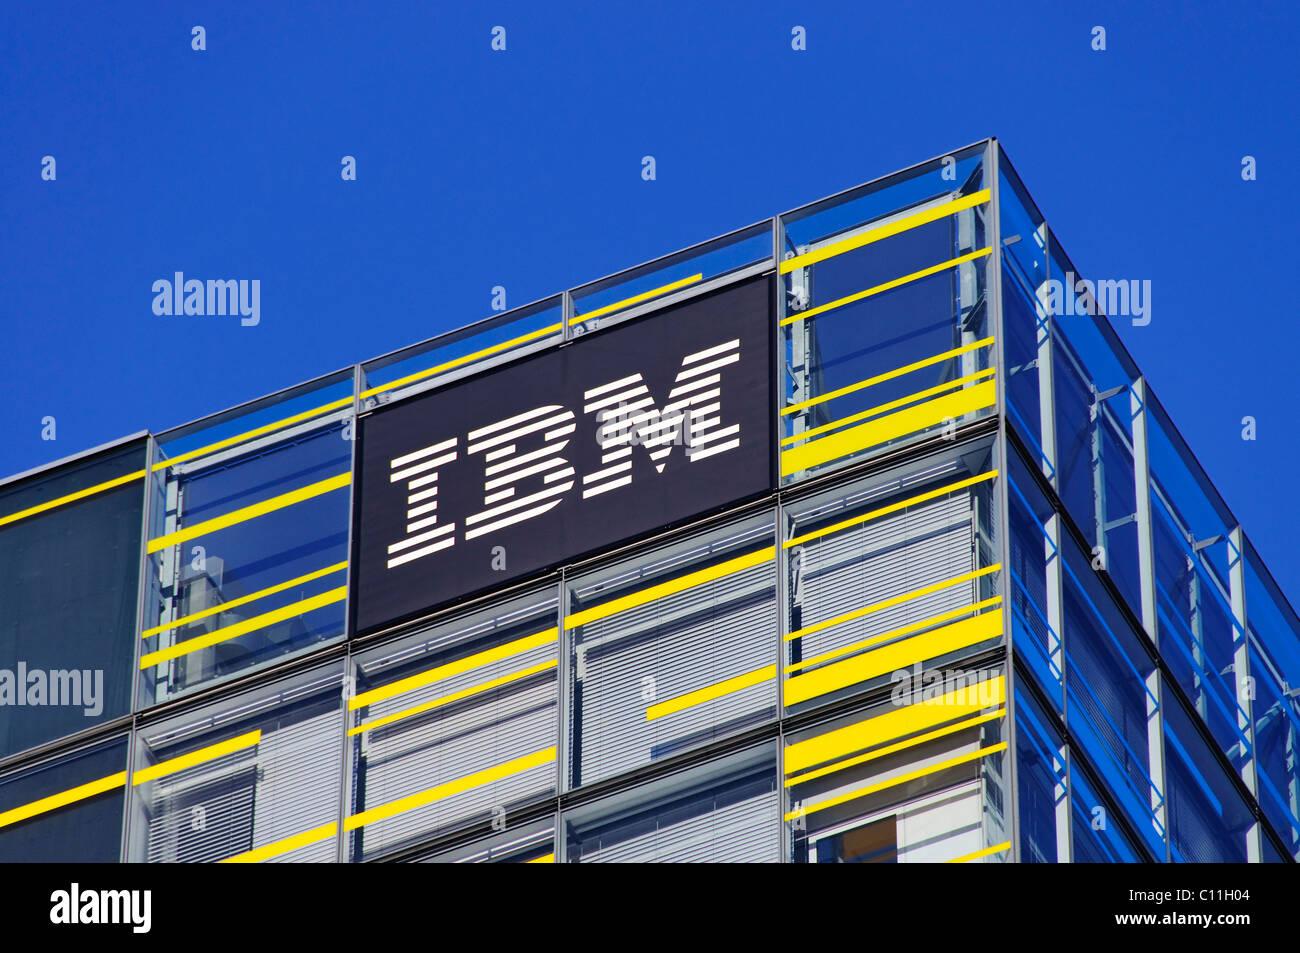 IBM logo on the front of the Hamburg IBM branch, Berliner Tor Centrum BTC, Hamburg, Germany, Europe - Stock Image